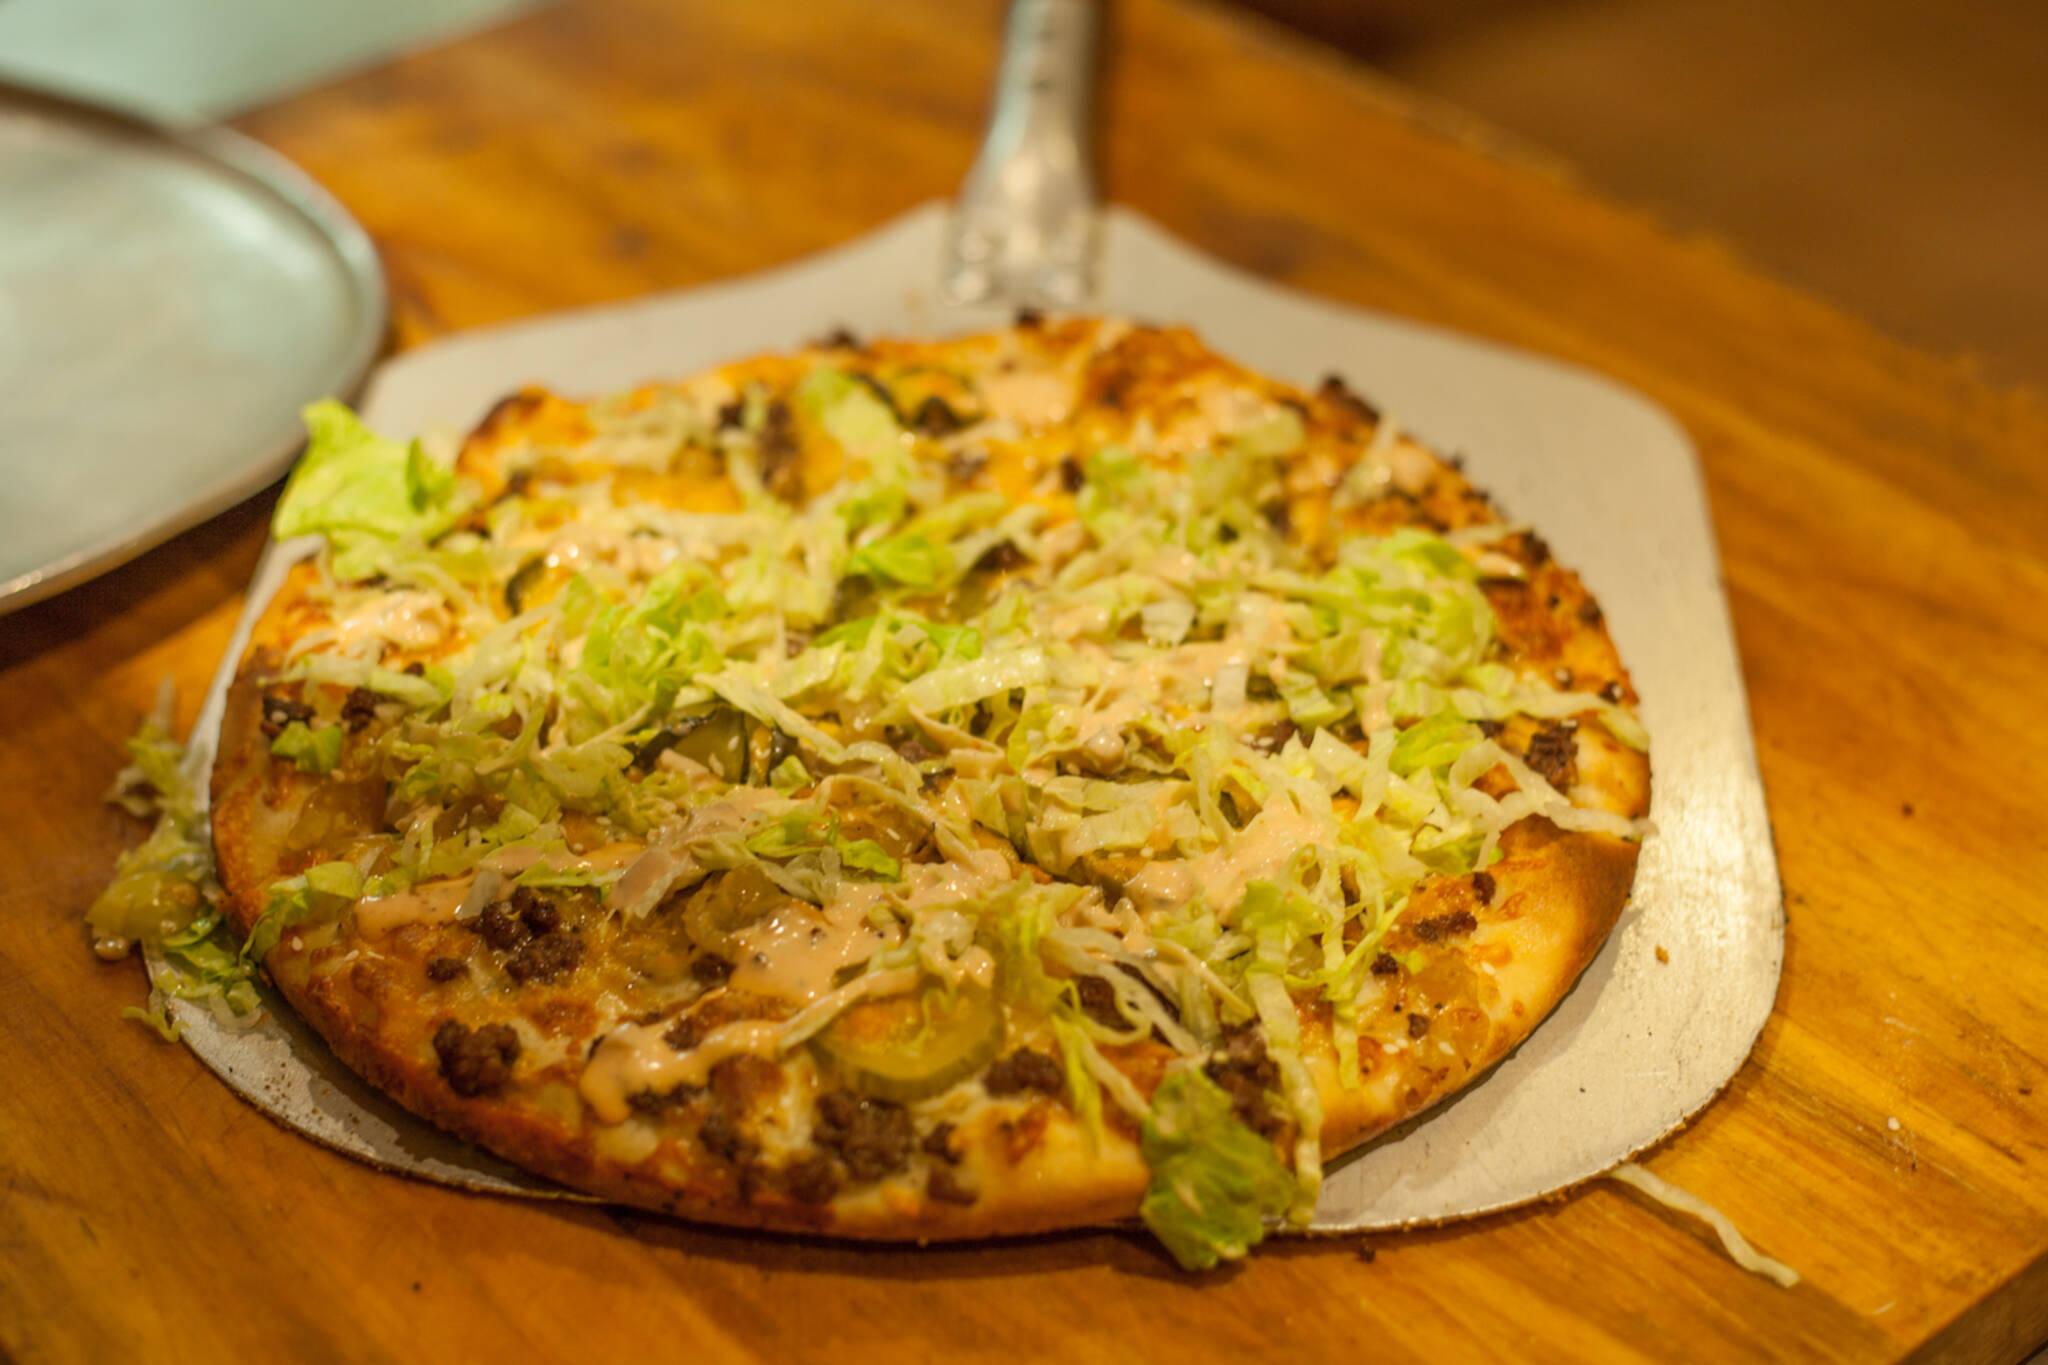 big house pizza toronto closing